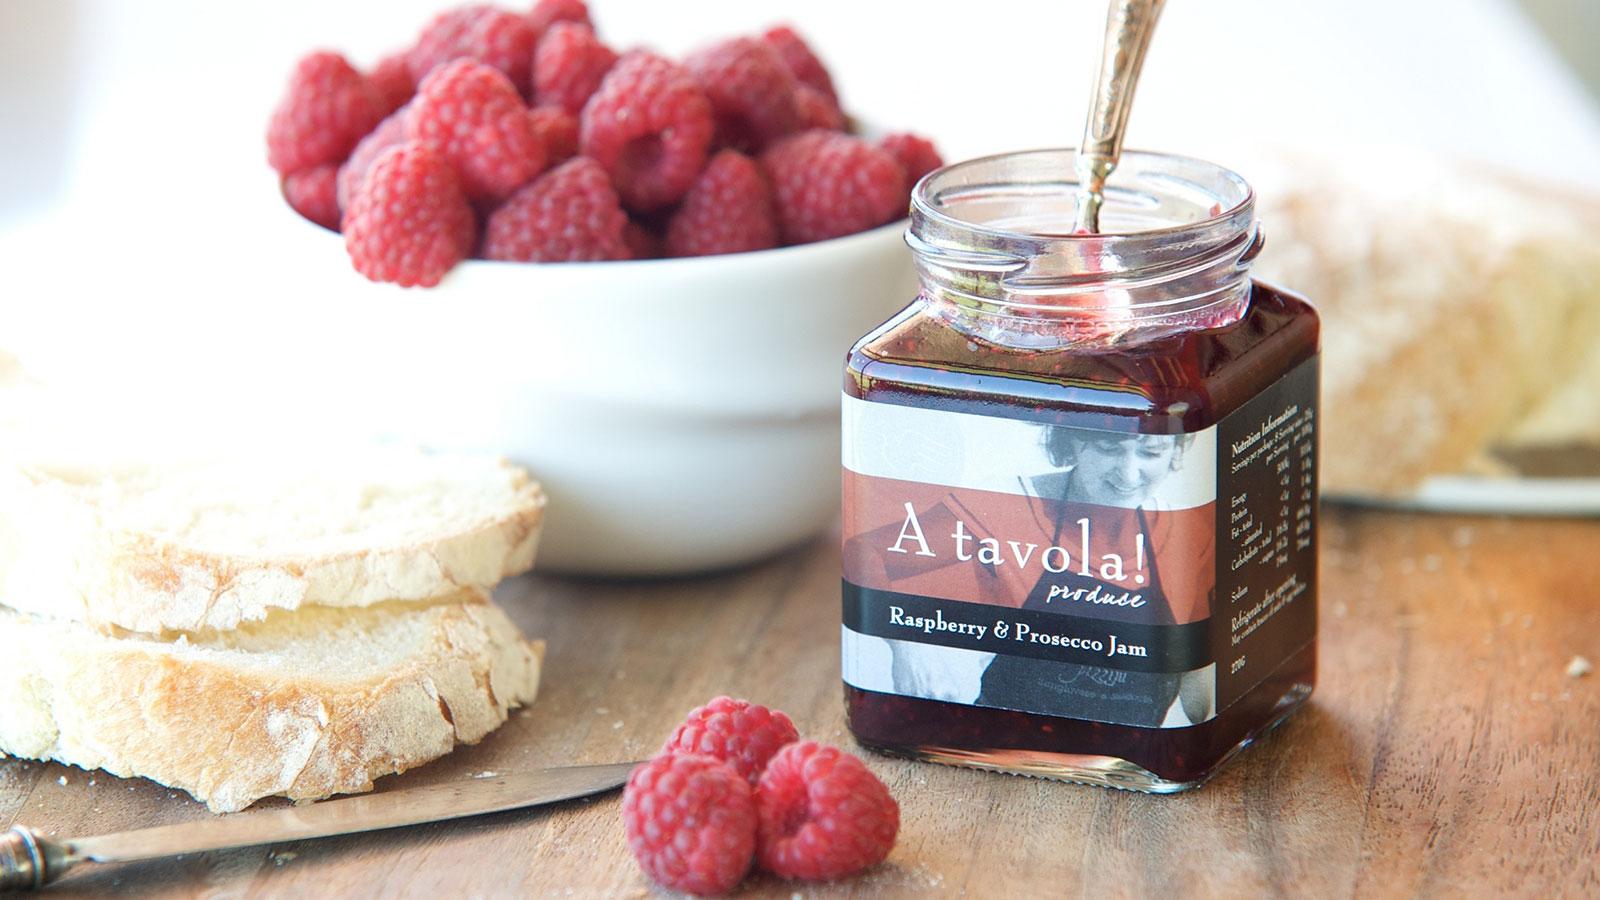 Raspeberry and prosecco jam, Pizzin Wines, High Country, Victoria, Australia